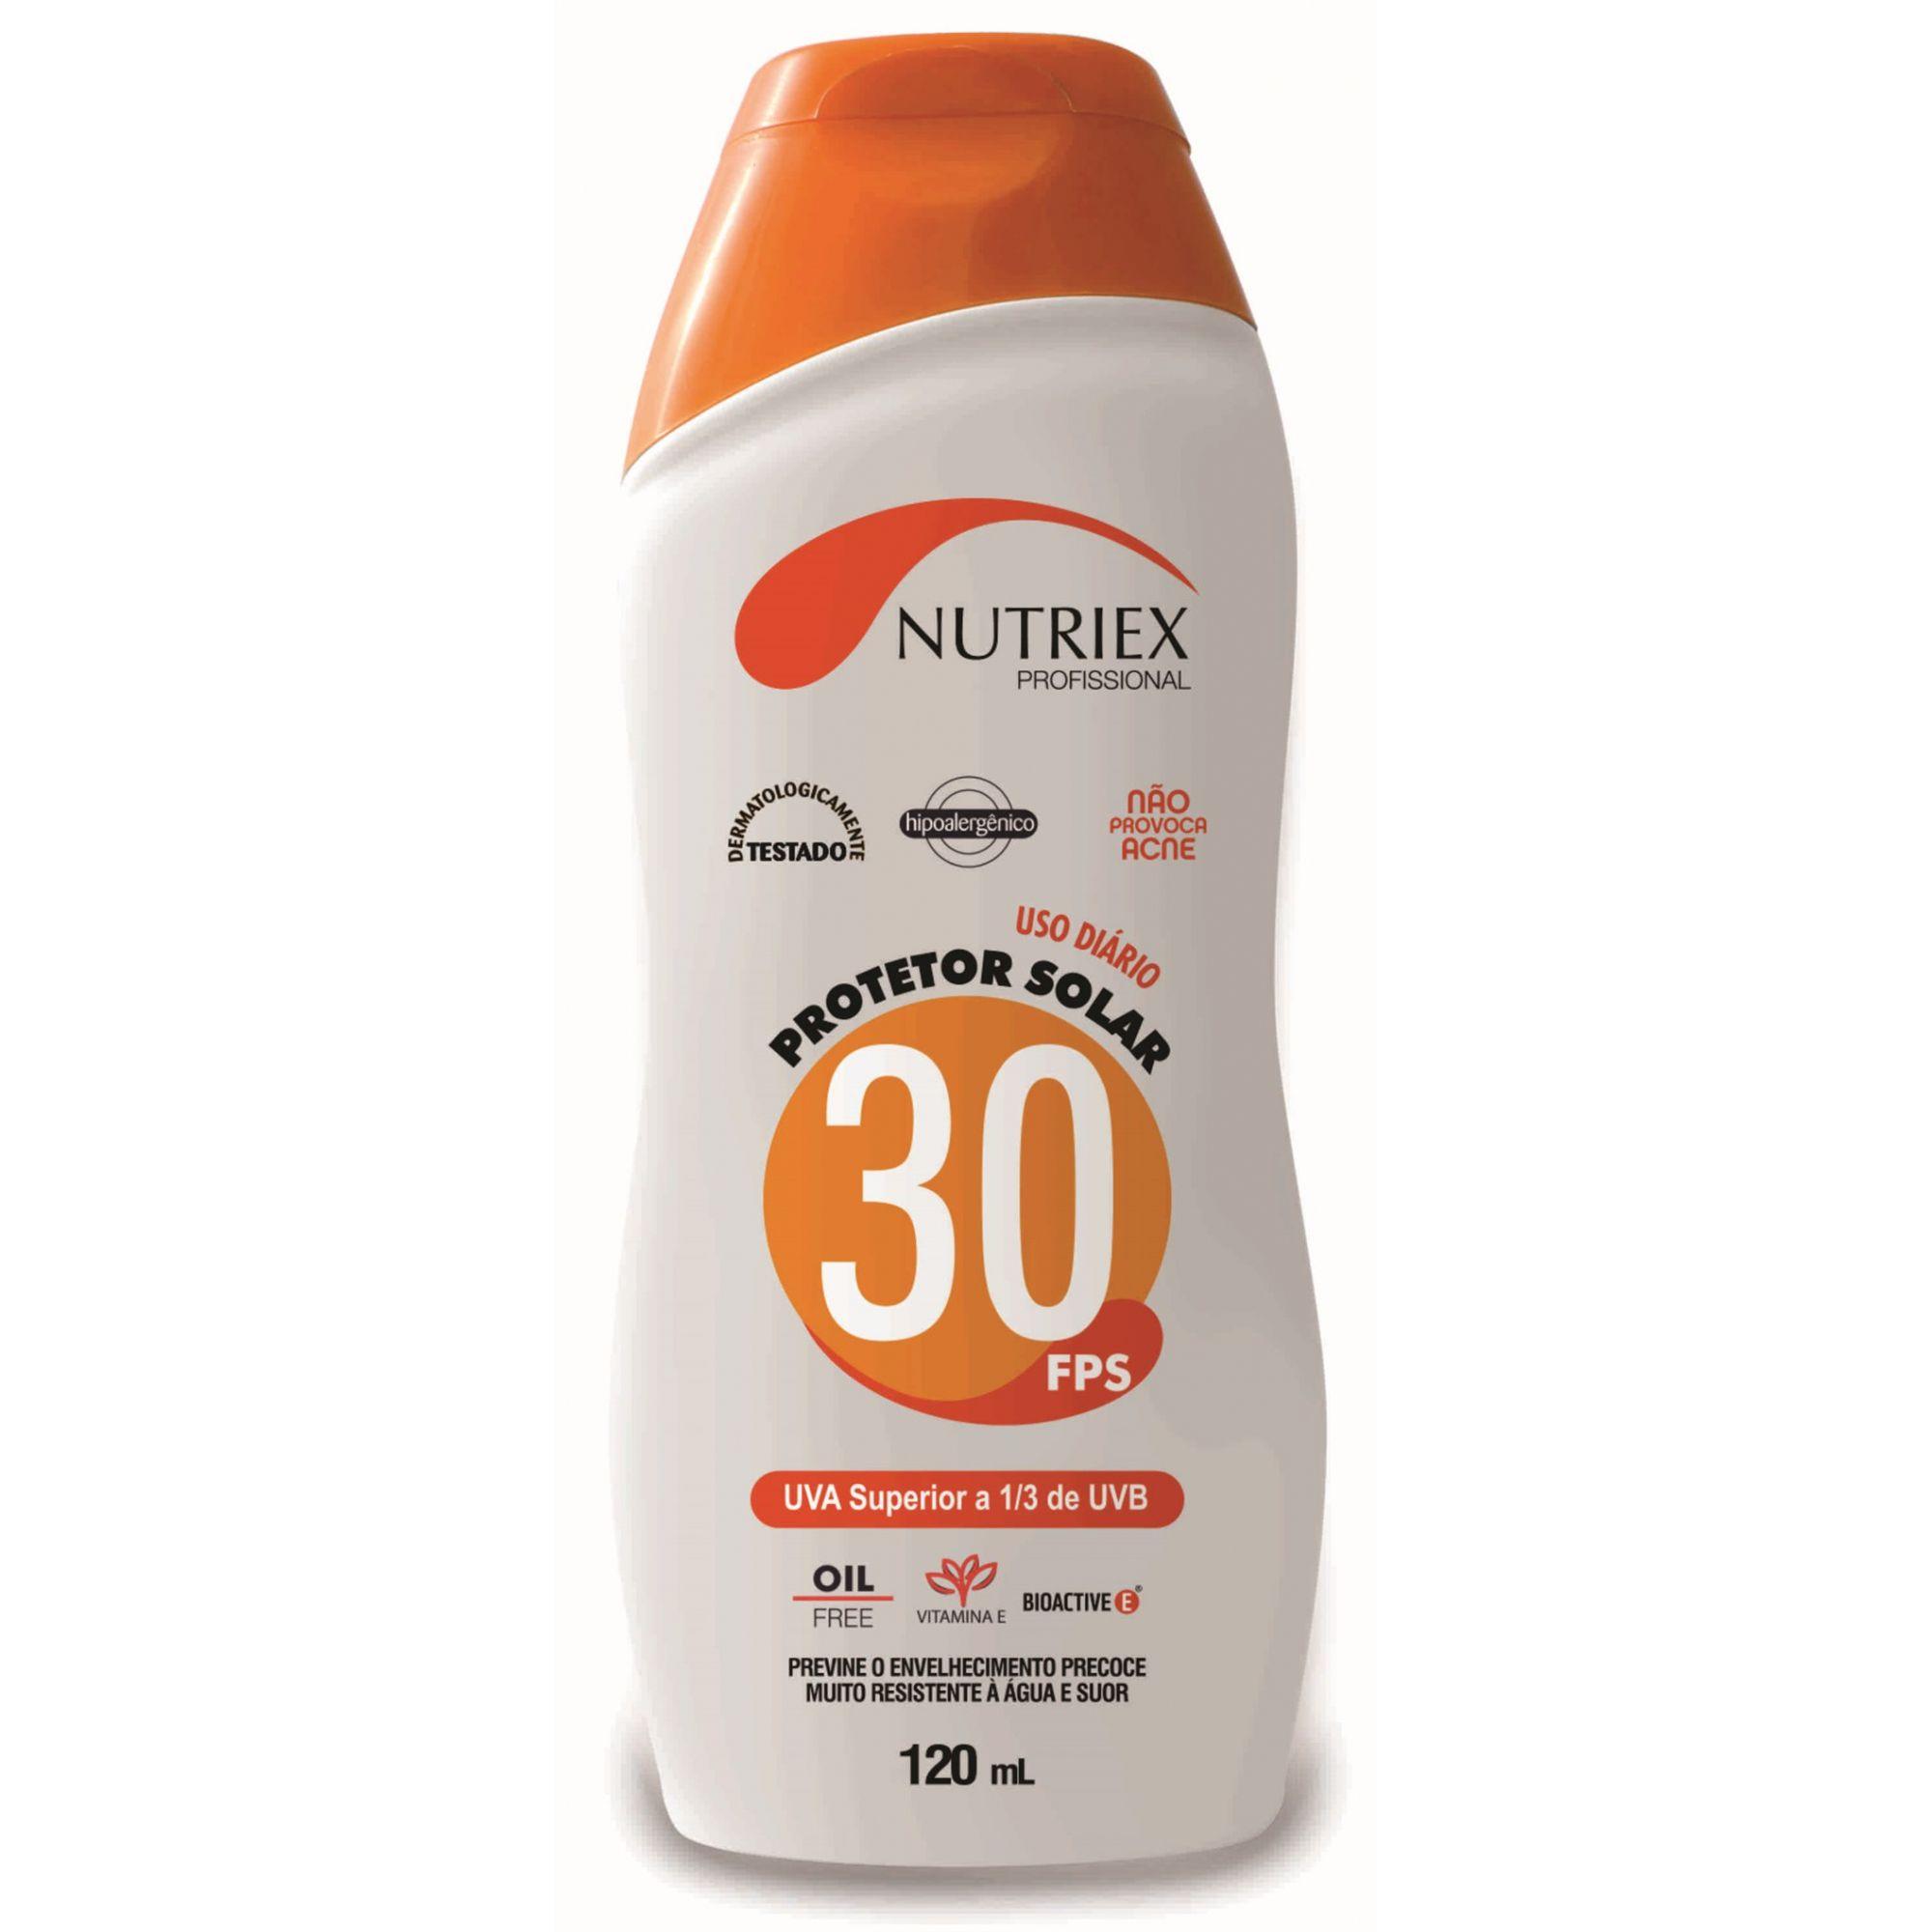 Protetor Solar Nutriex Fps 30 Bisnaga 120 ml